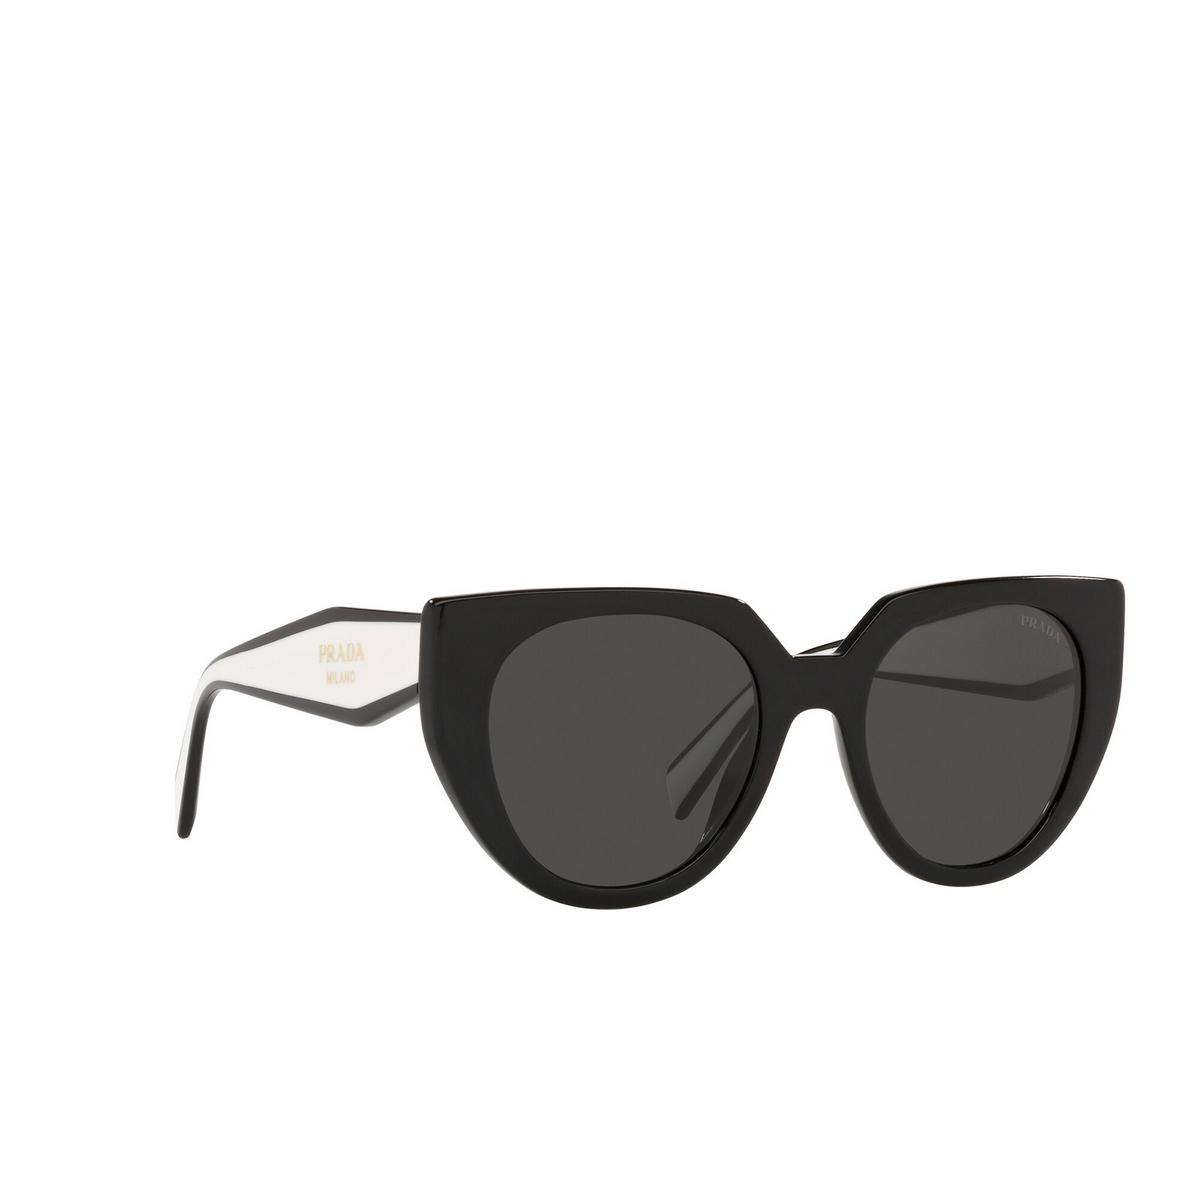 Prada® Cat-eye Sunglasses: PR 14WS color Black / Talc 09Q5S0.